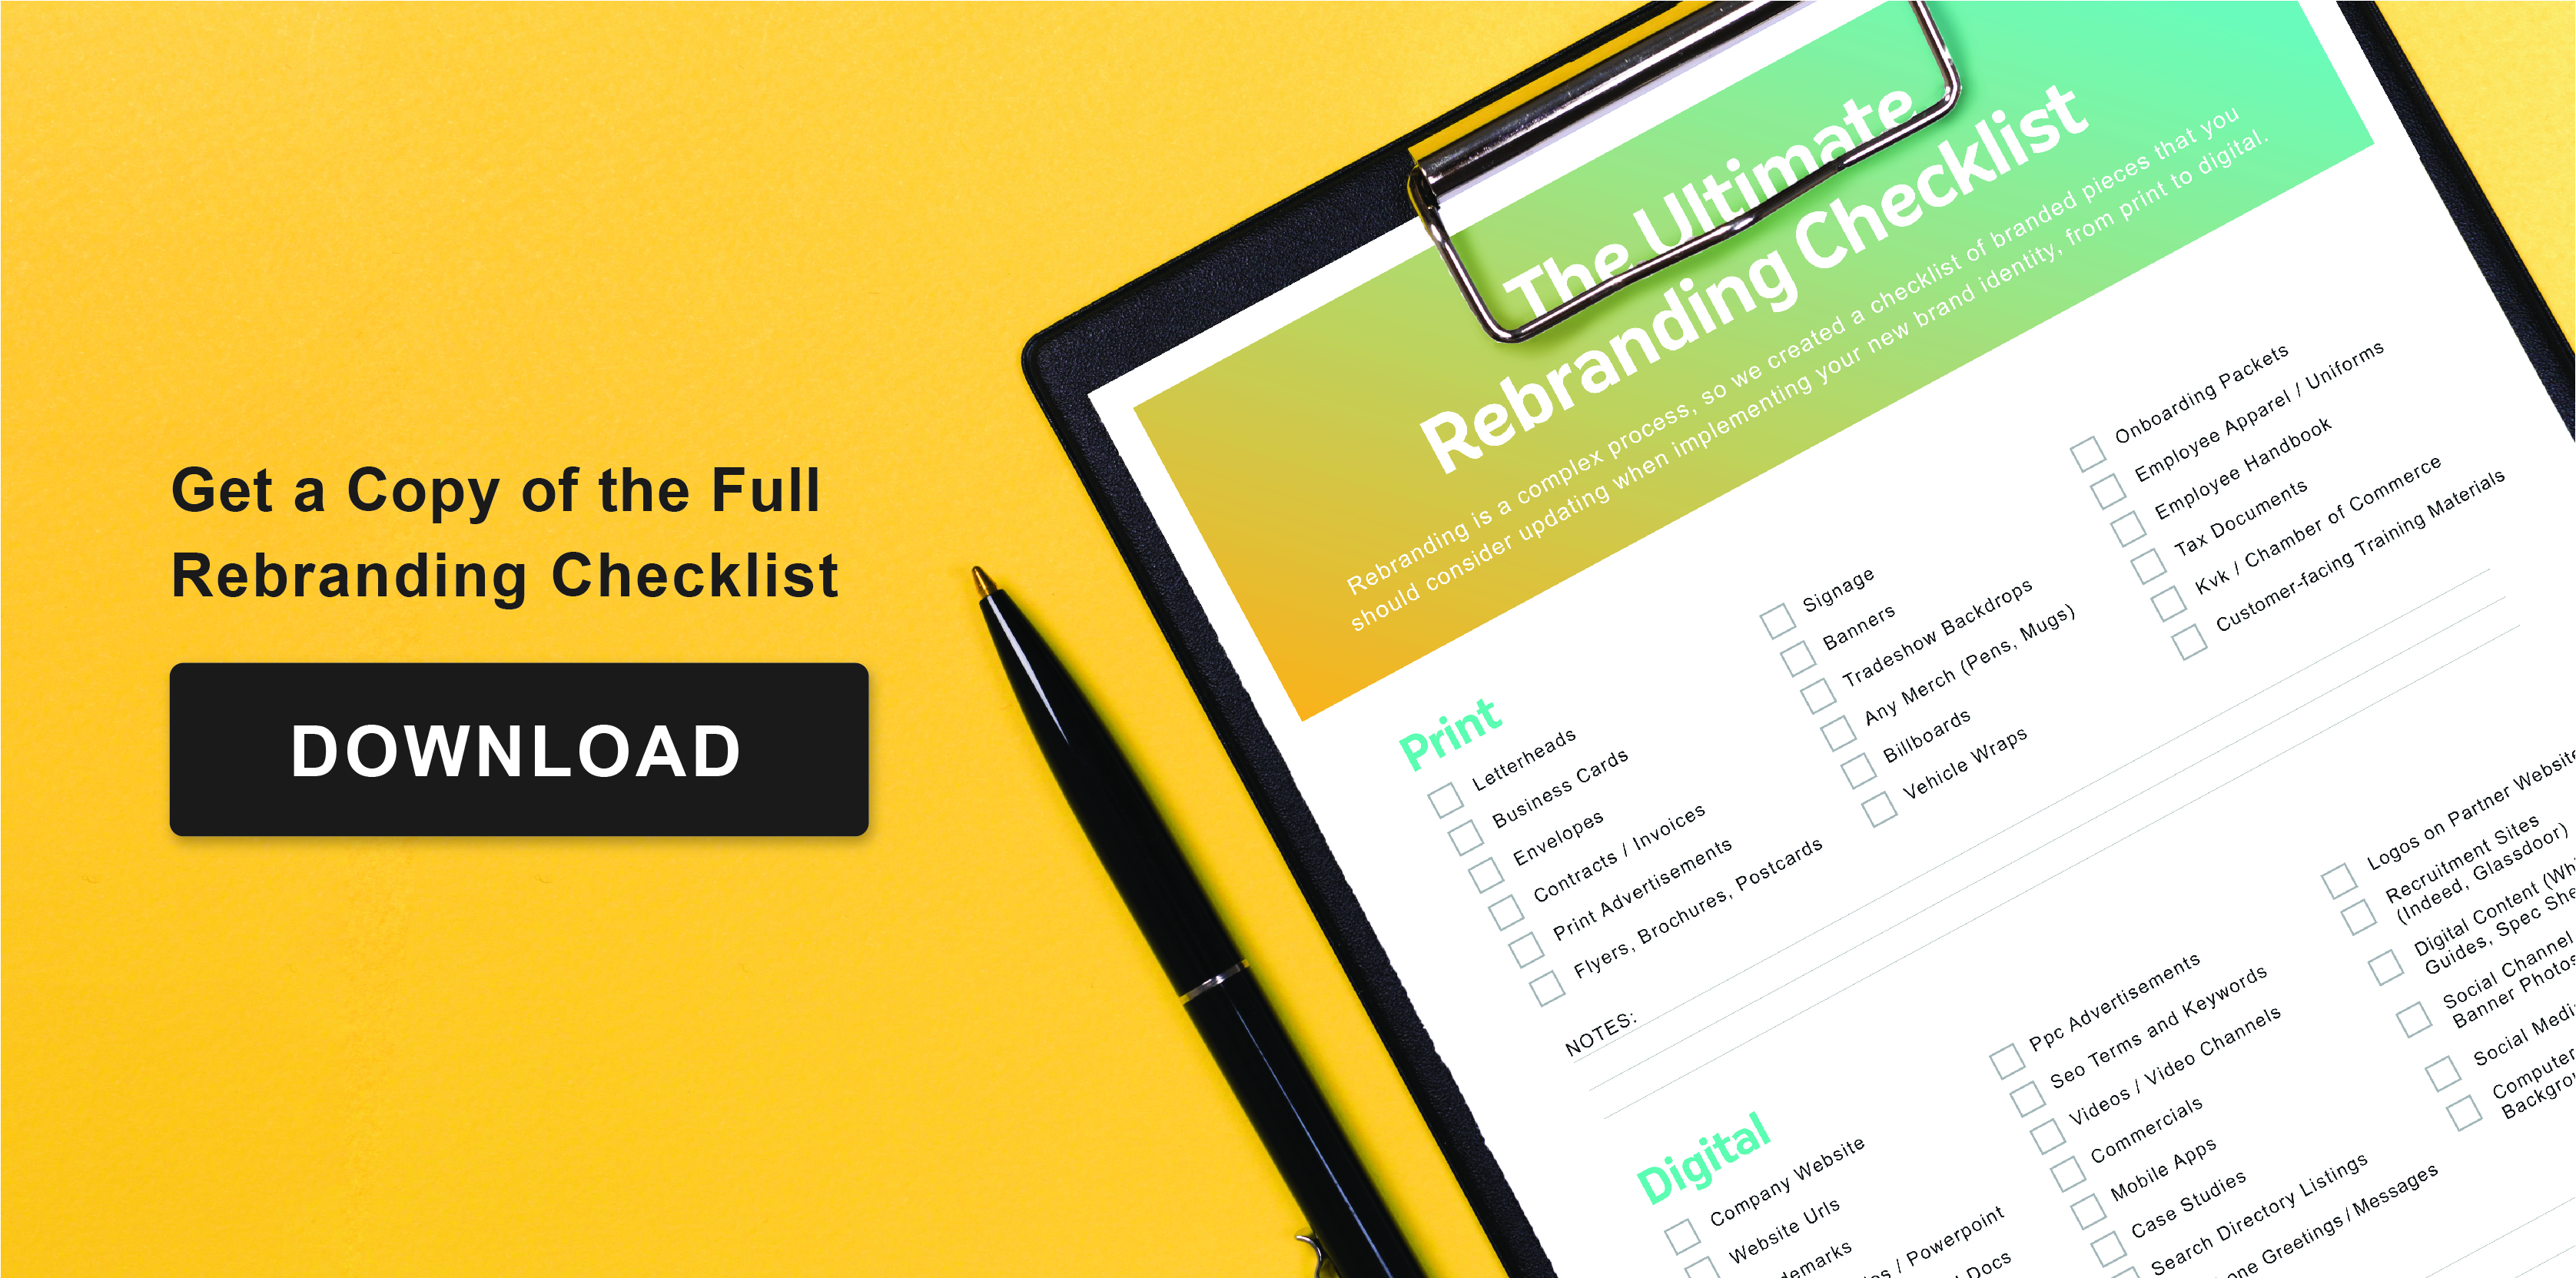 Rebranding Checklist Download